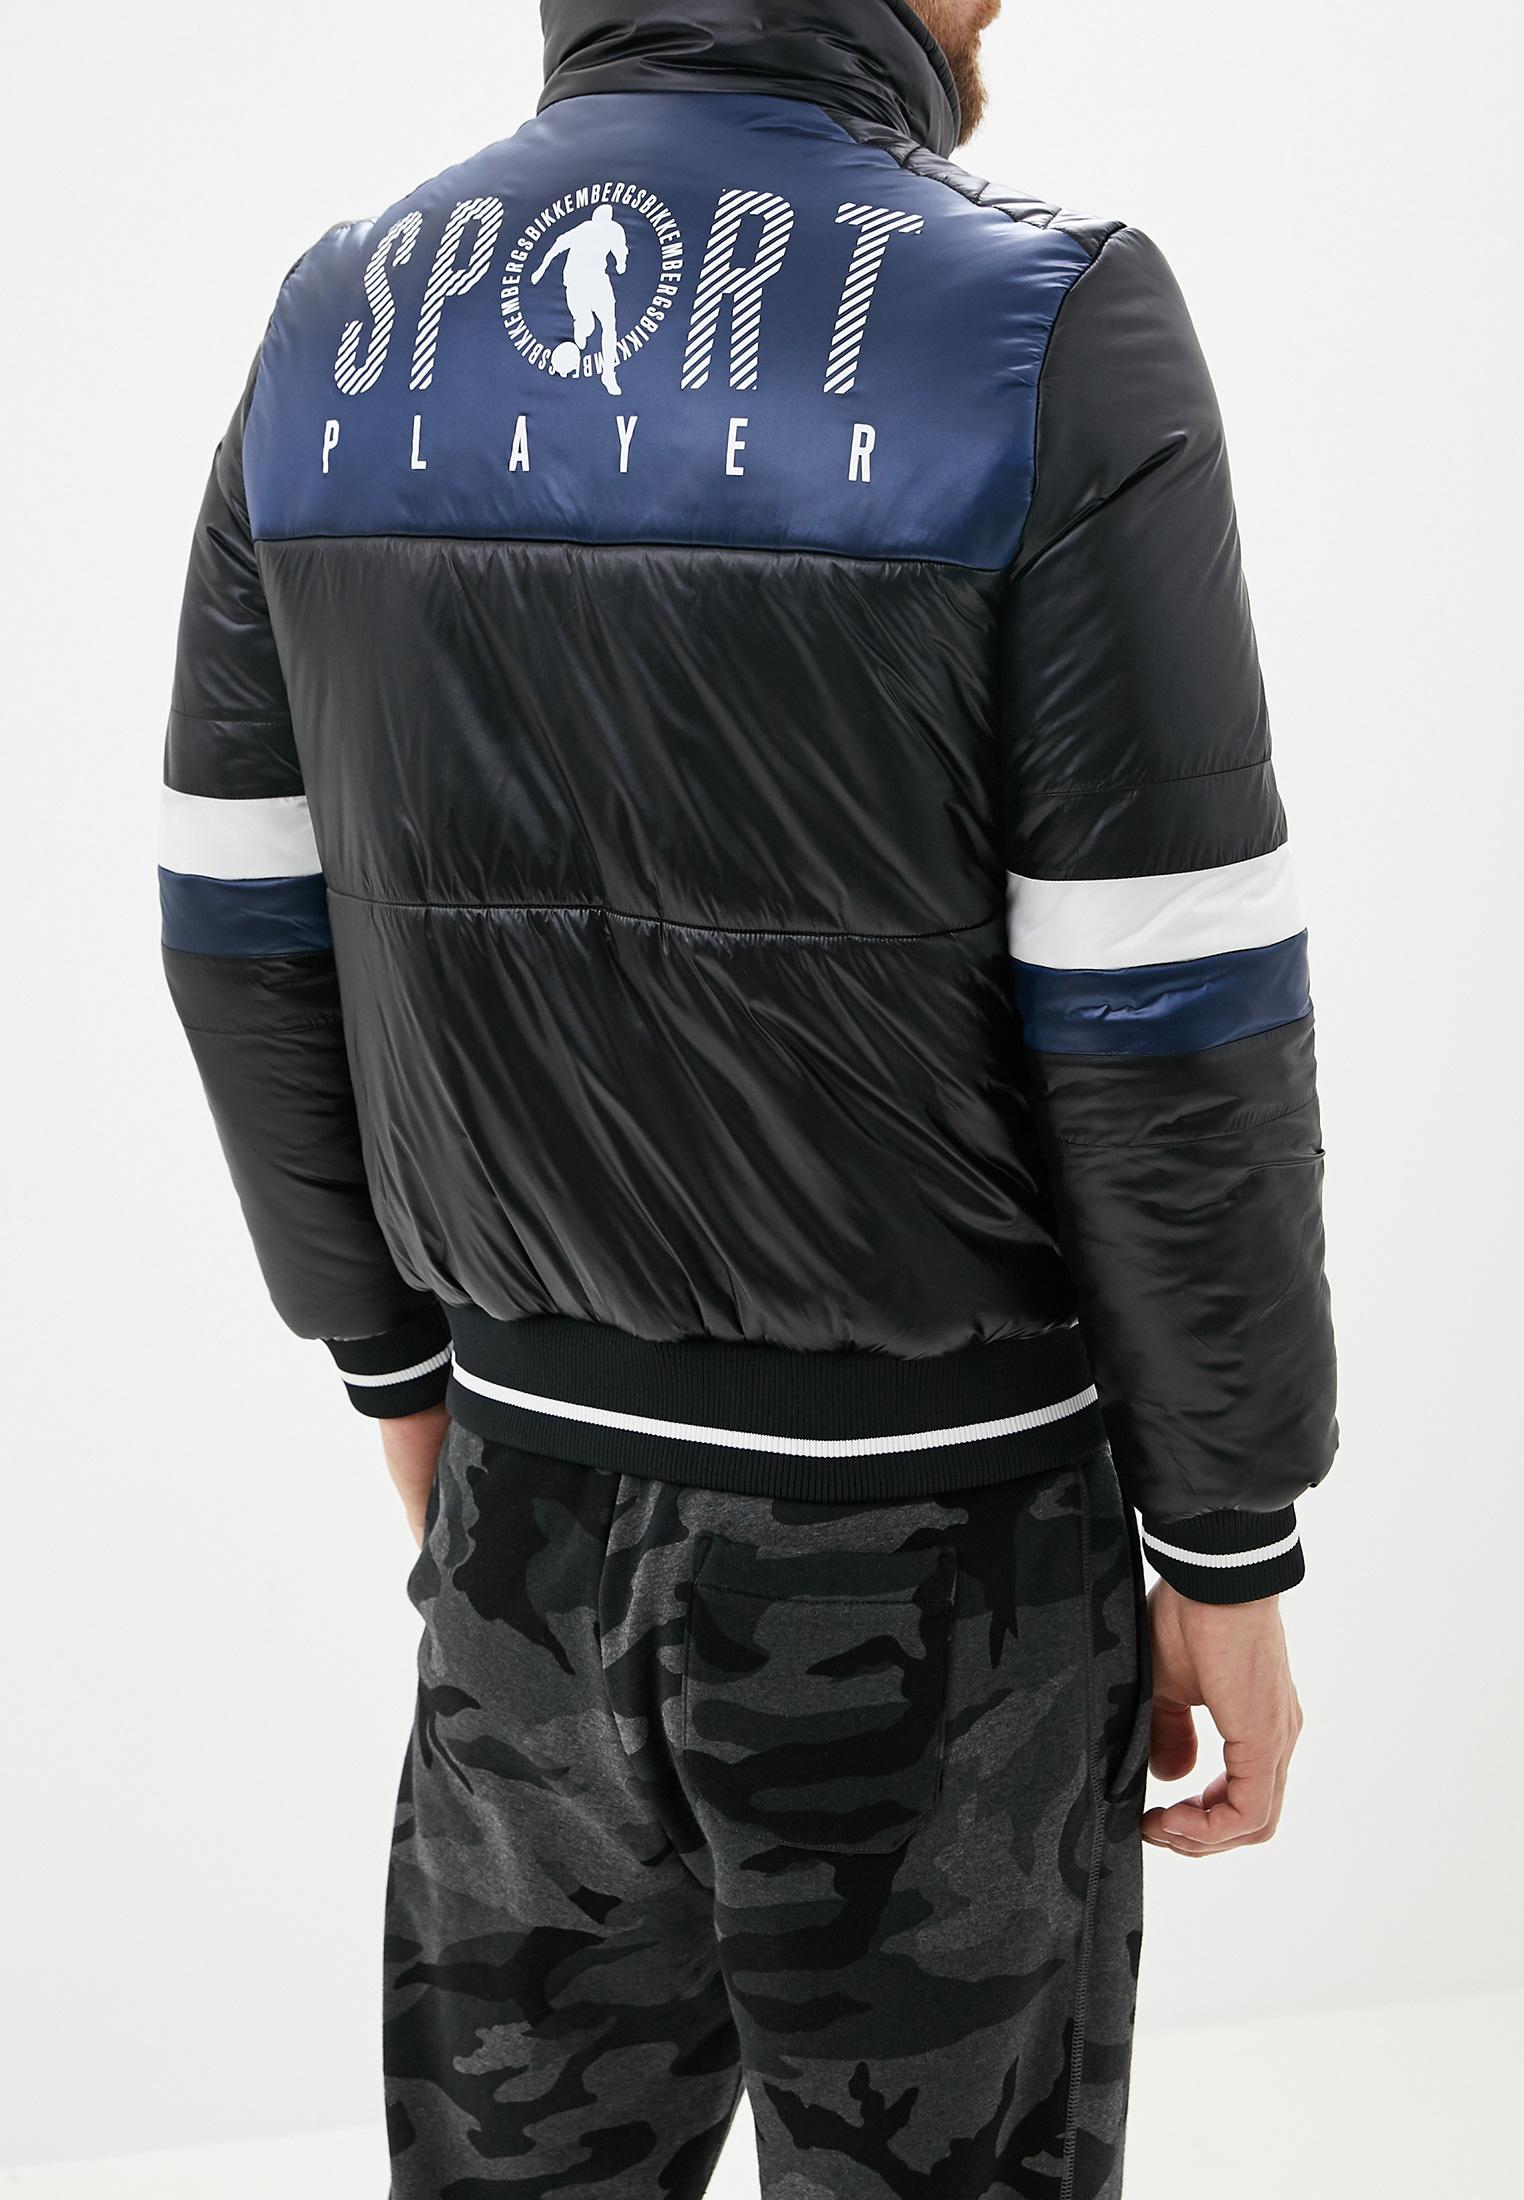 Мужская куртка Bikkembergs (Биккембергс) C H 082 01 T 9846: изображение 3